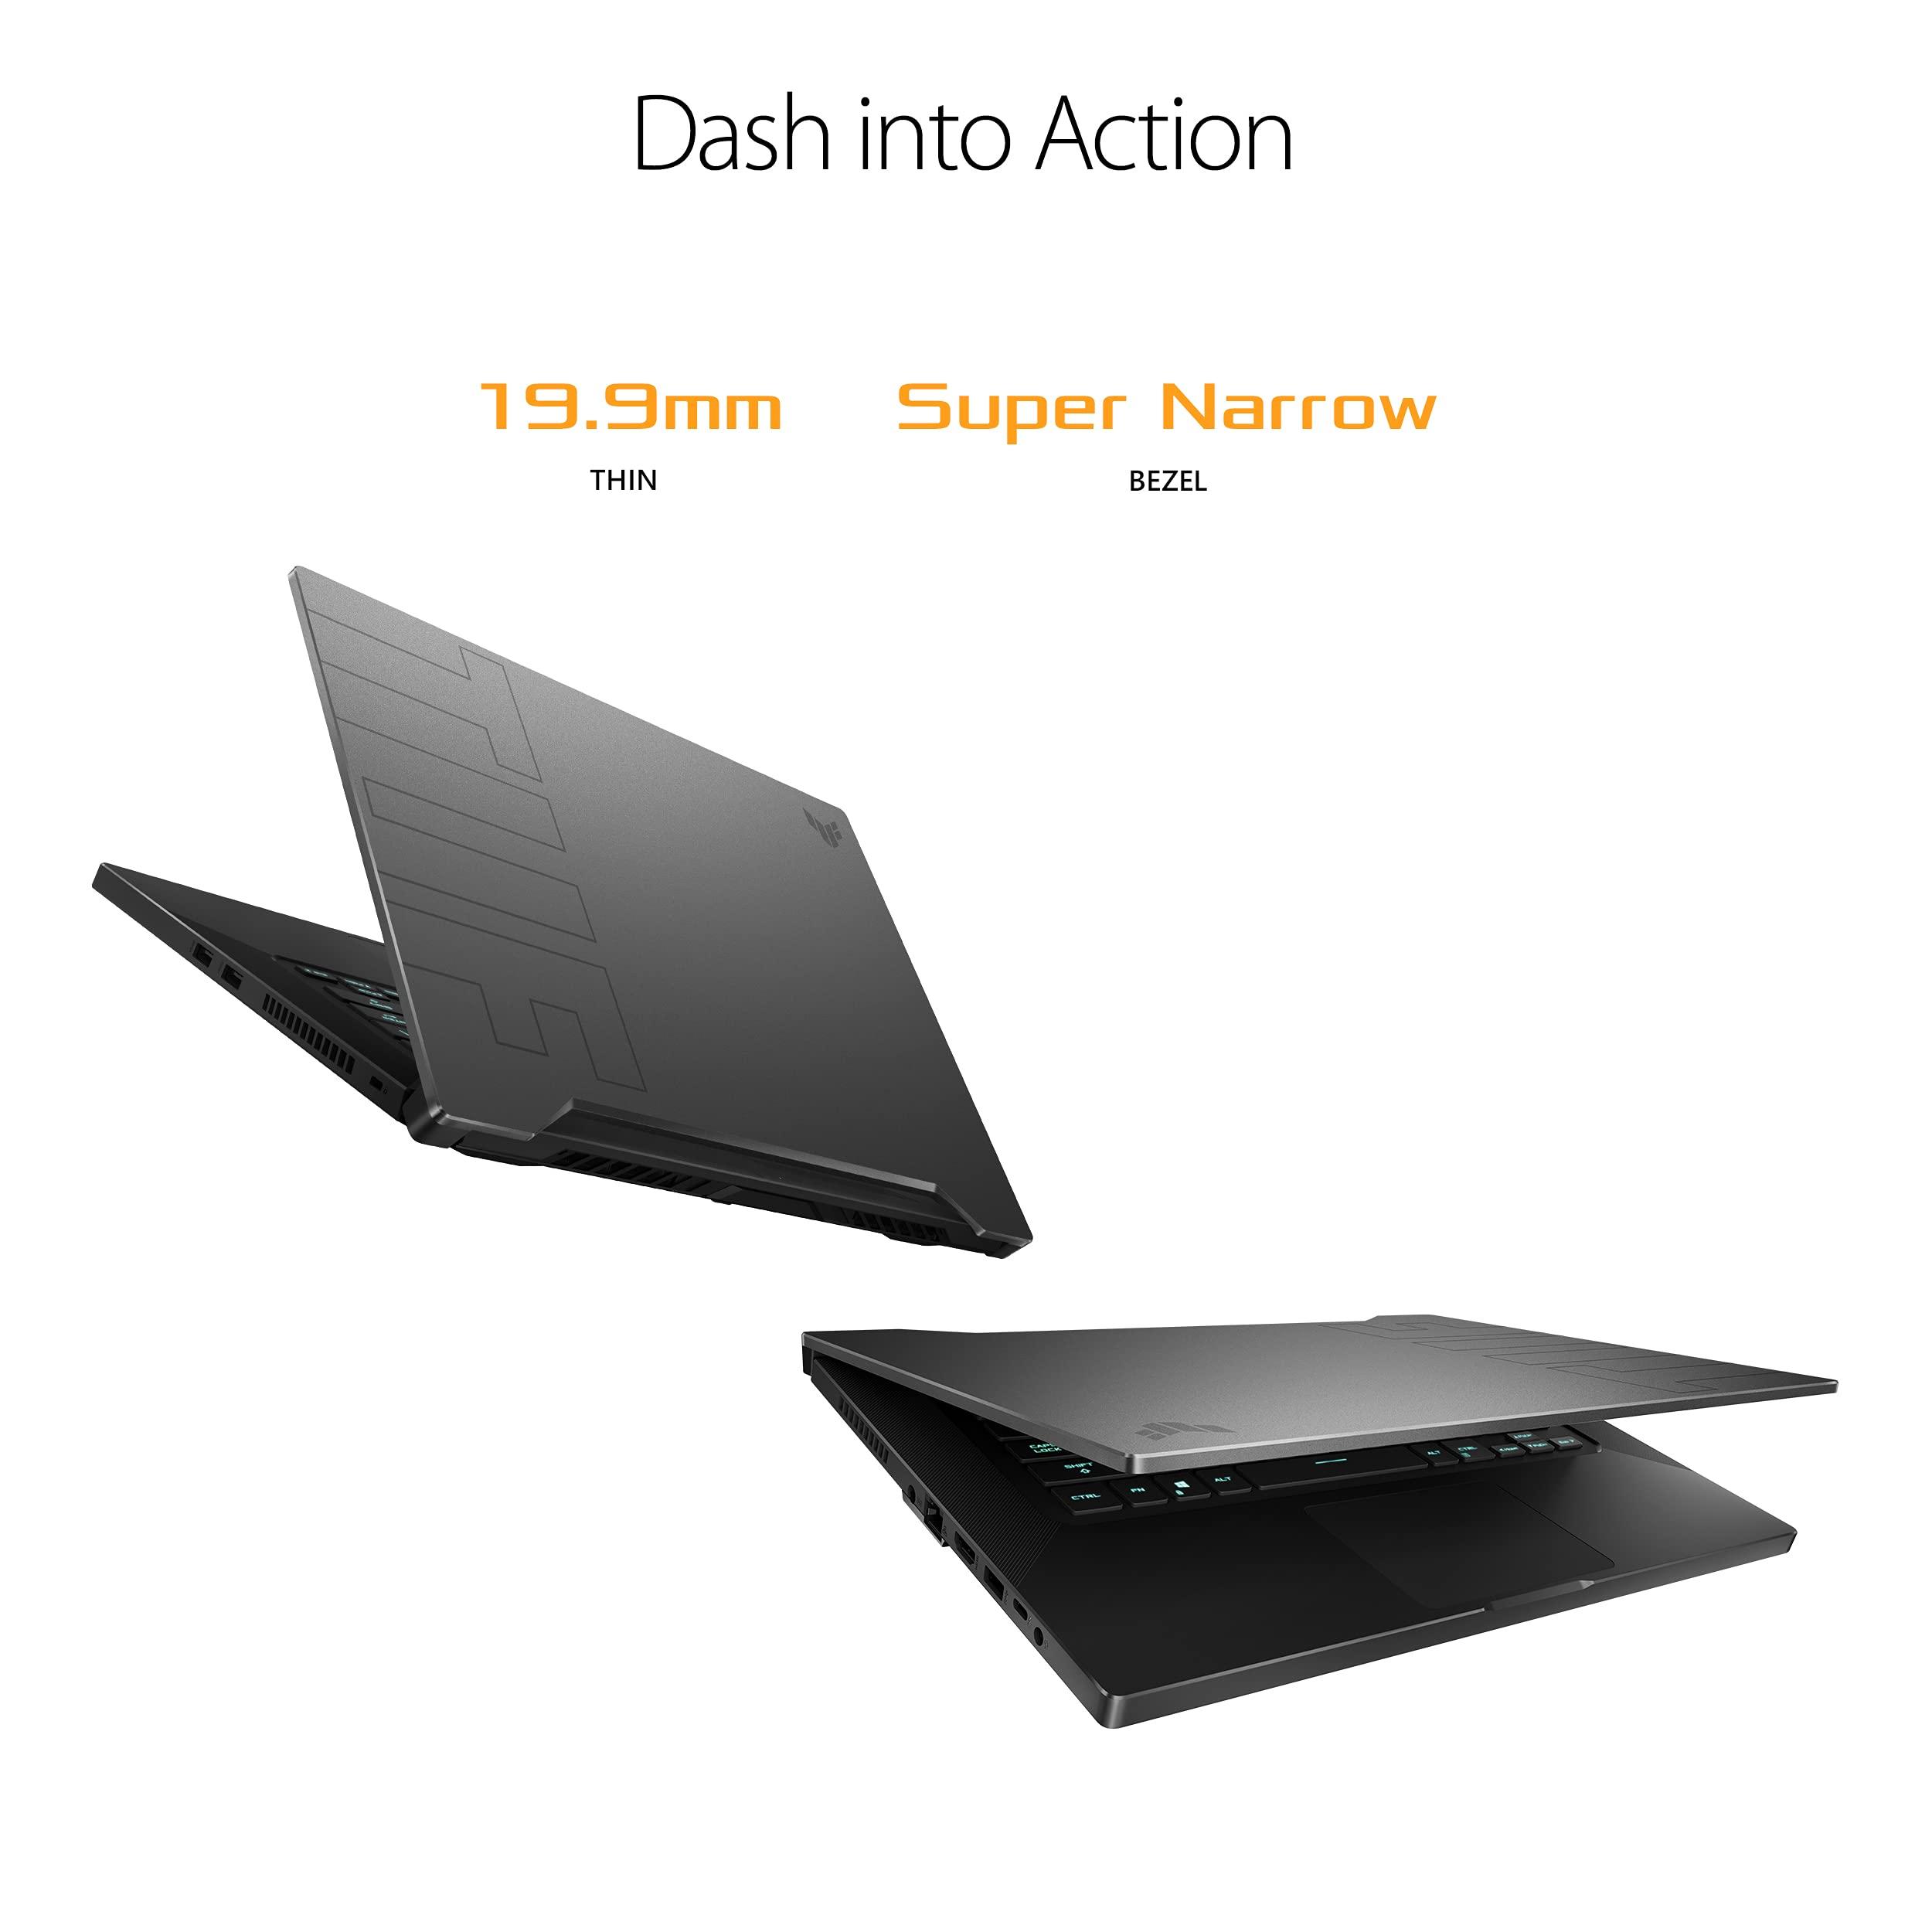 "ASUS TUF Dash 15 (2021) Ultra Slim Gaming Laptop, 15.6"" 144Hz FHD, GeForce RTX 3050 Ti, Intel Core i7-11370H, 8GB DDR4, 512GB PCIe NVMe SSD, Wi-Fi 6, Windows 10, Eclipse Grey Color, TUF516PE-AB73"